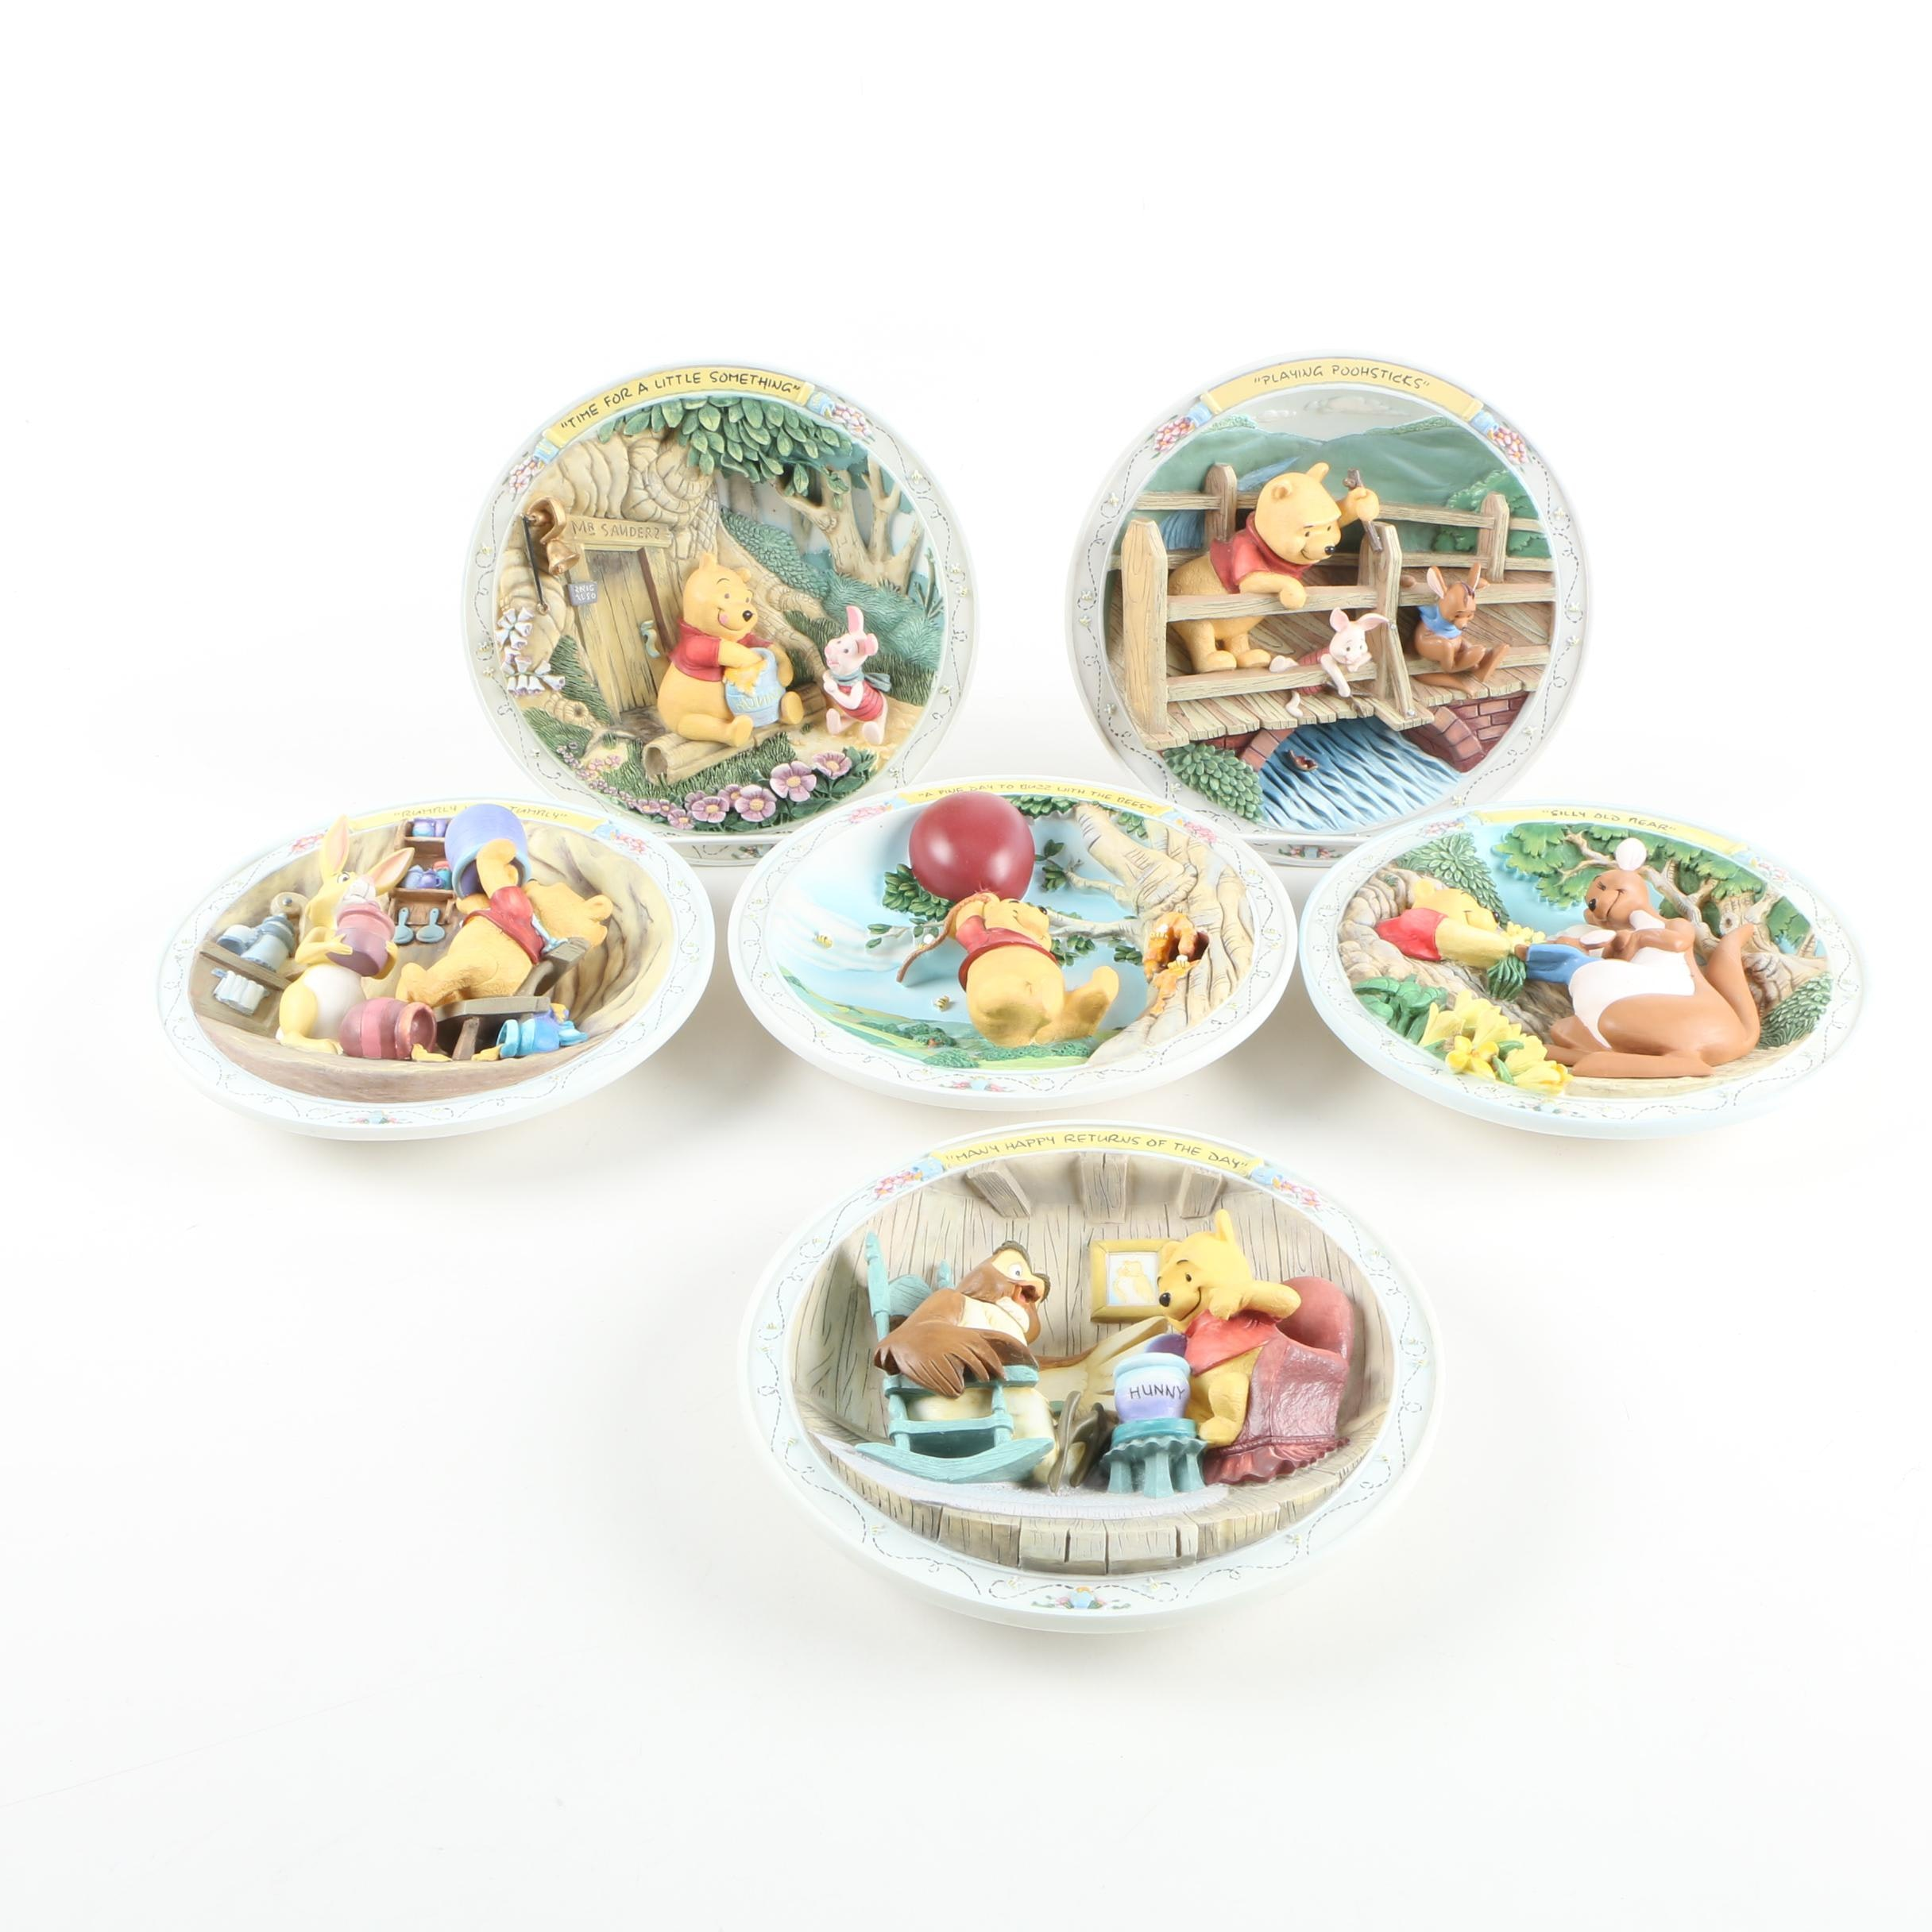 Bradford Exchange Winnie the Pooh Ceramic Plates ...  sc 1 st  EBTH.com & Bradford Exchange Winnie the Pooh Ceramic Plates : EBTH